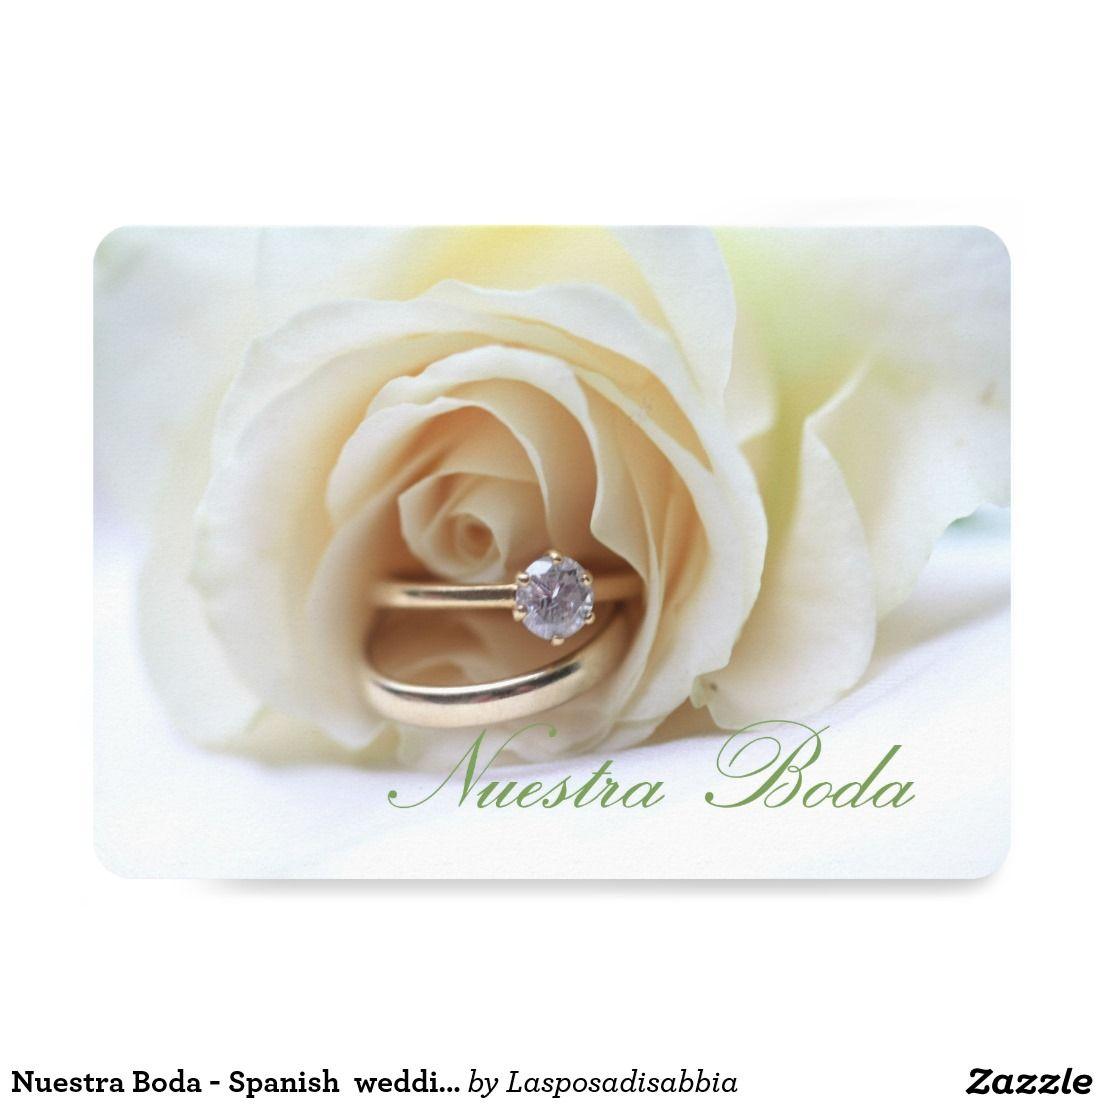 Nuestra Boda - Spanish wedding invitation | Pinterest | Spanish ...